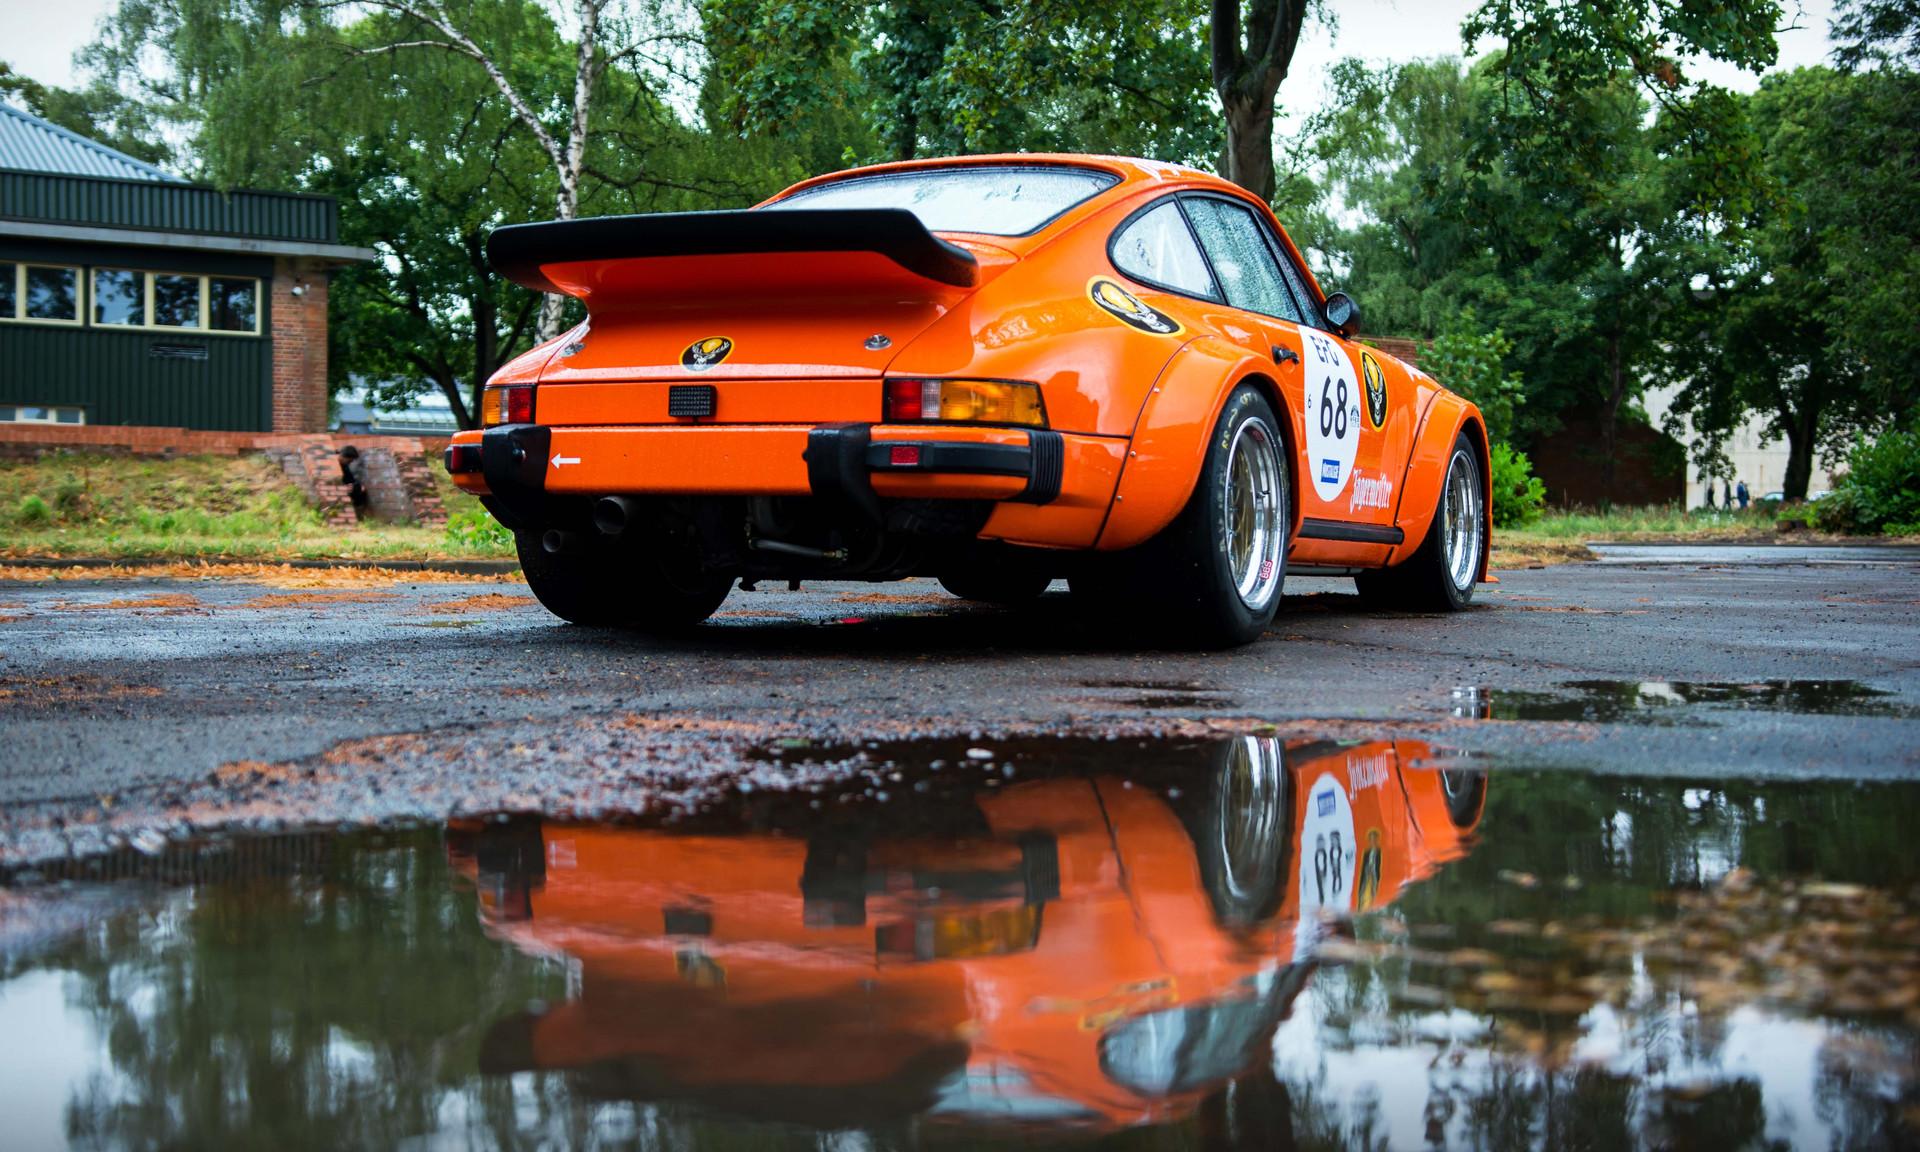 1976 Porsche 934 RSR Turbo Group 4